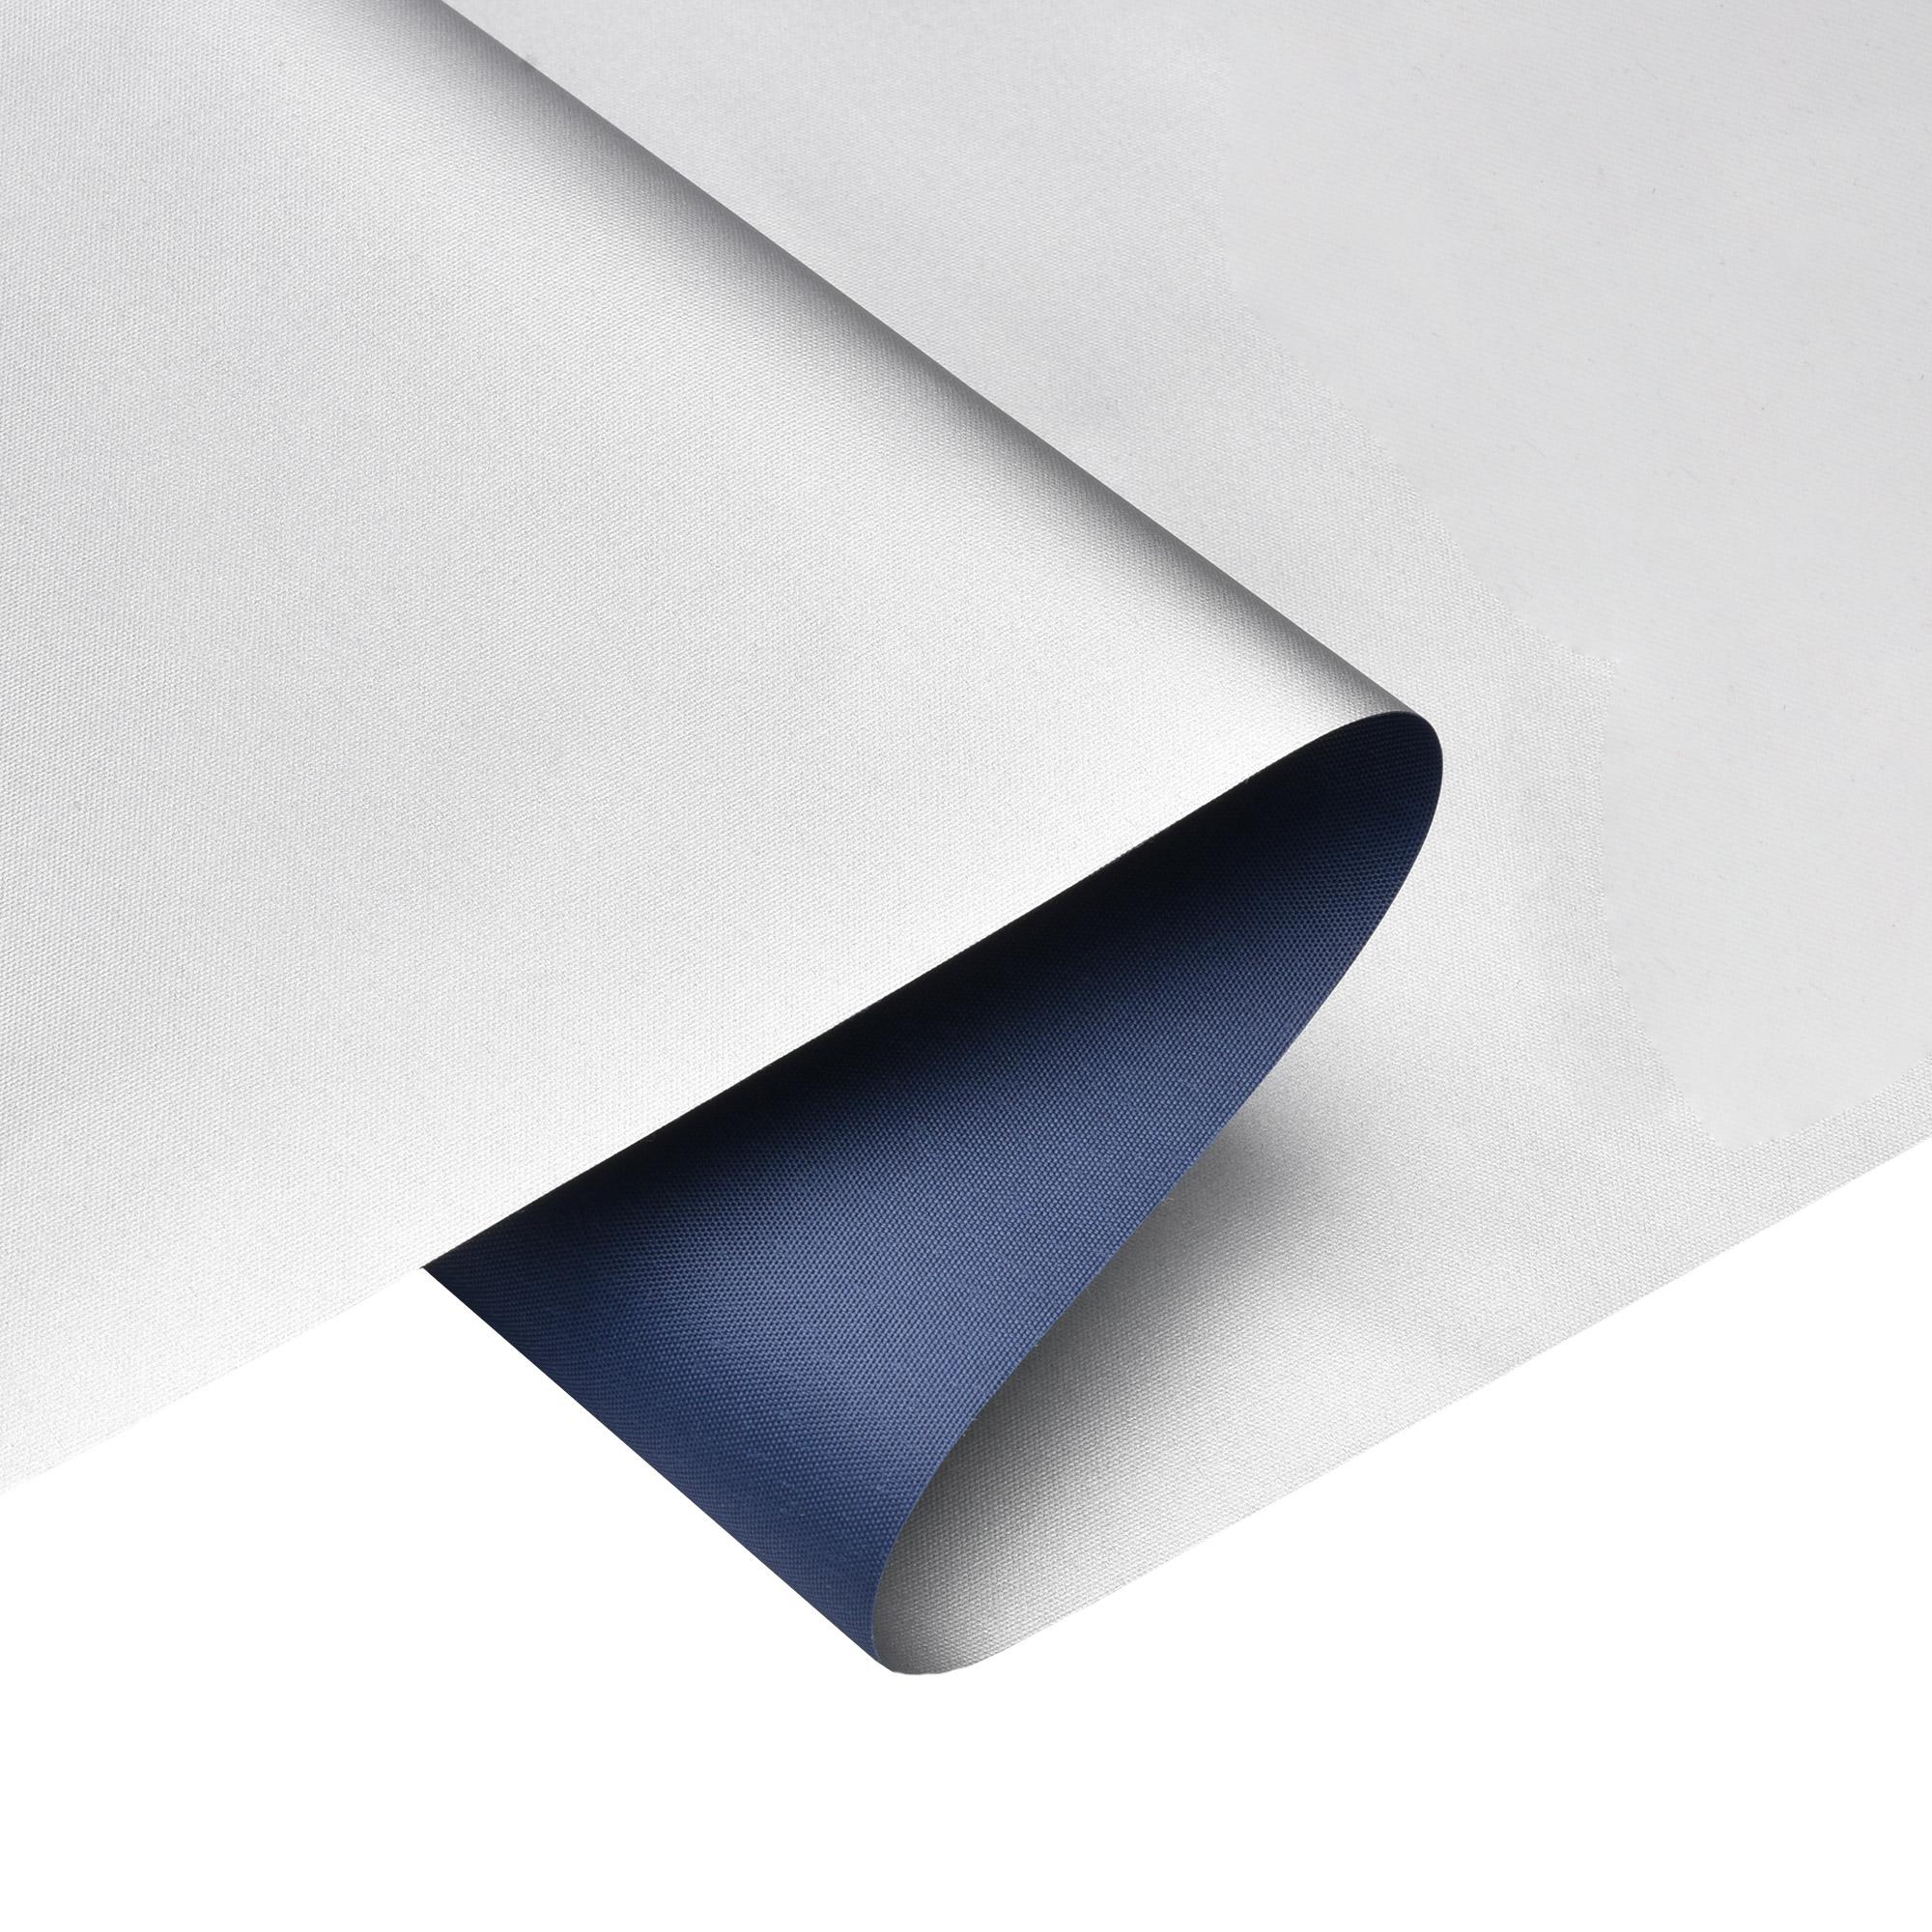 thermorollo klemmfix ohne bohren verdunkelungsrollo thermo fenster rollo t ren ebay. Black Bedroom Furniture Sets. Home Design Ideas